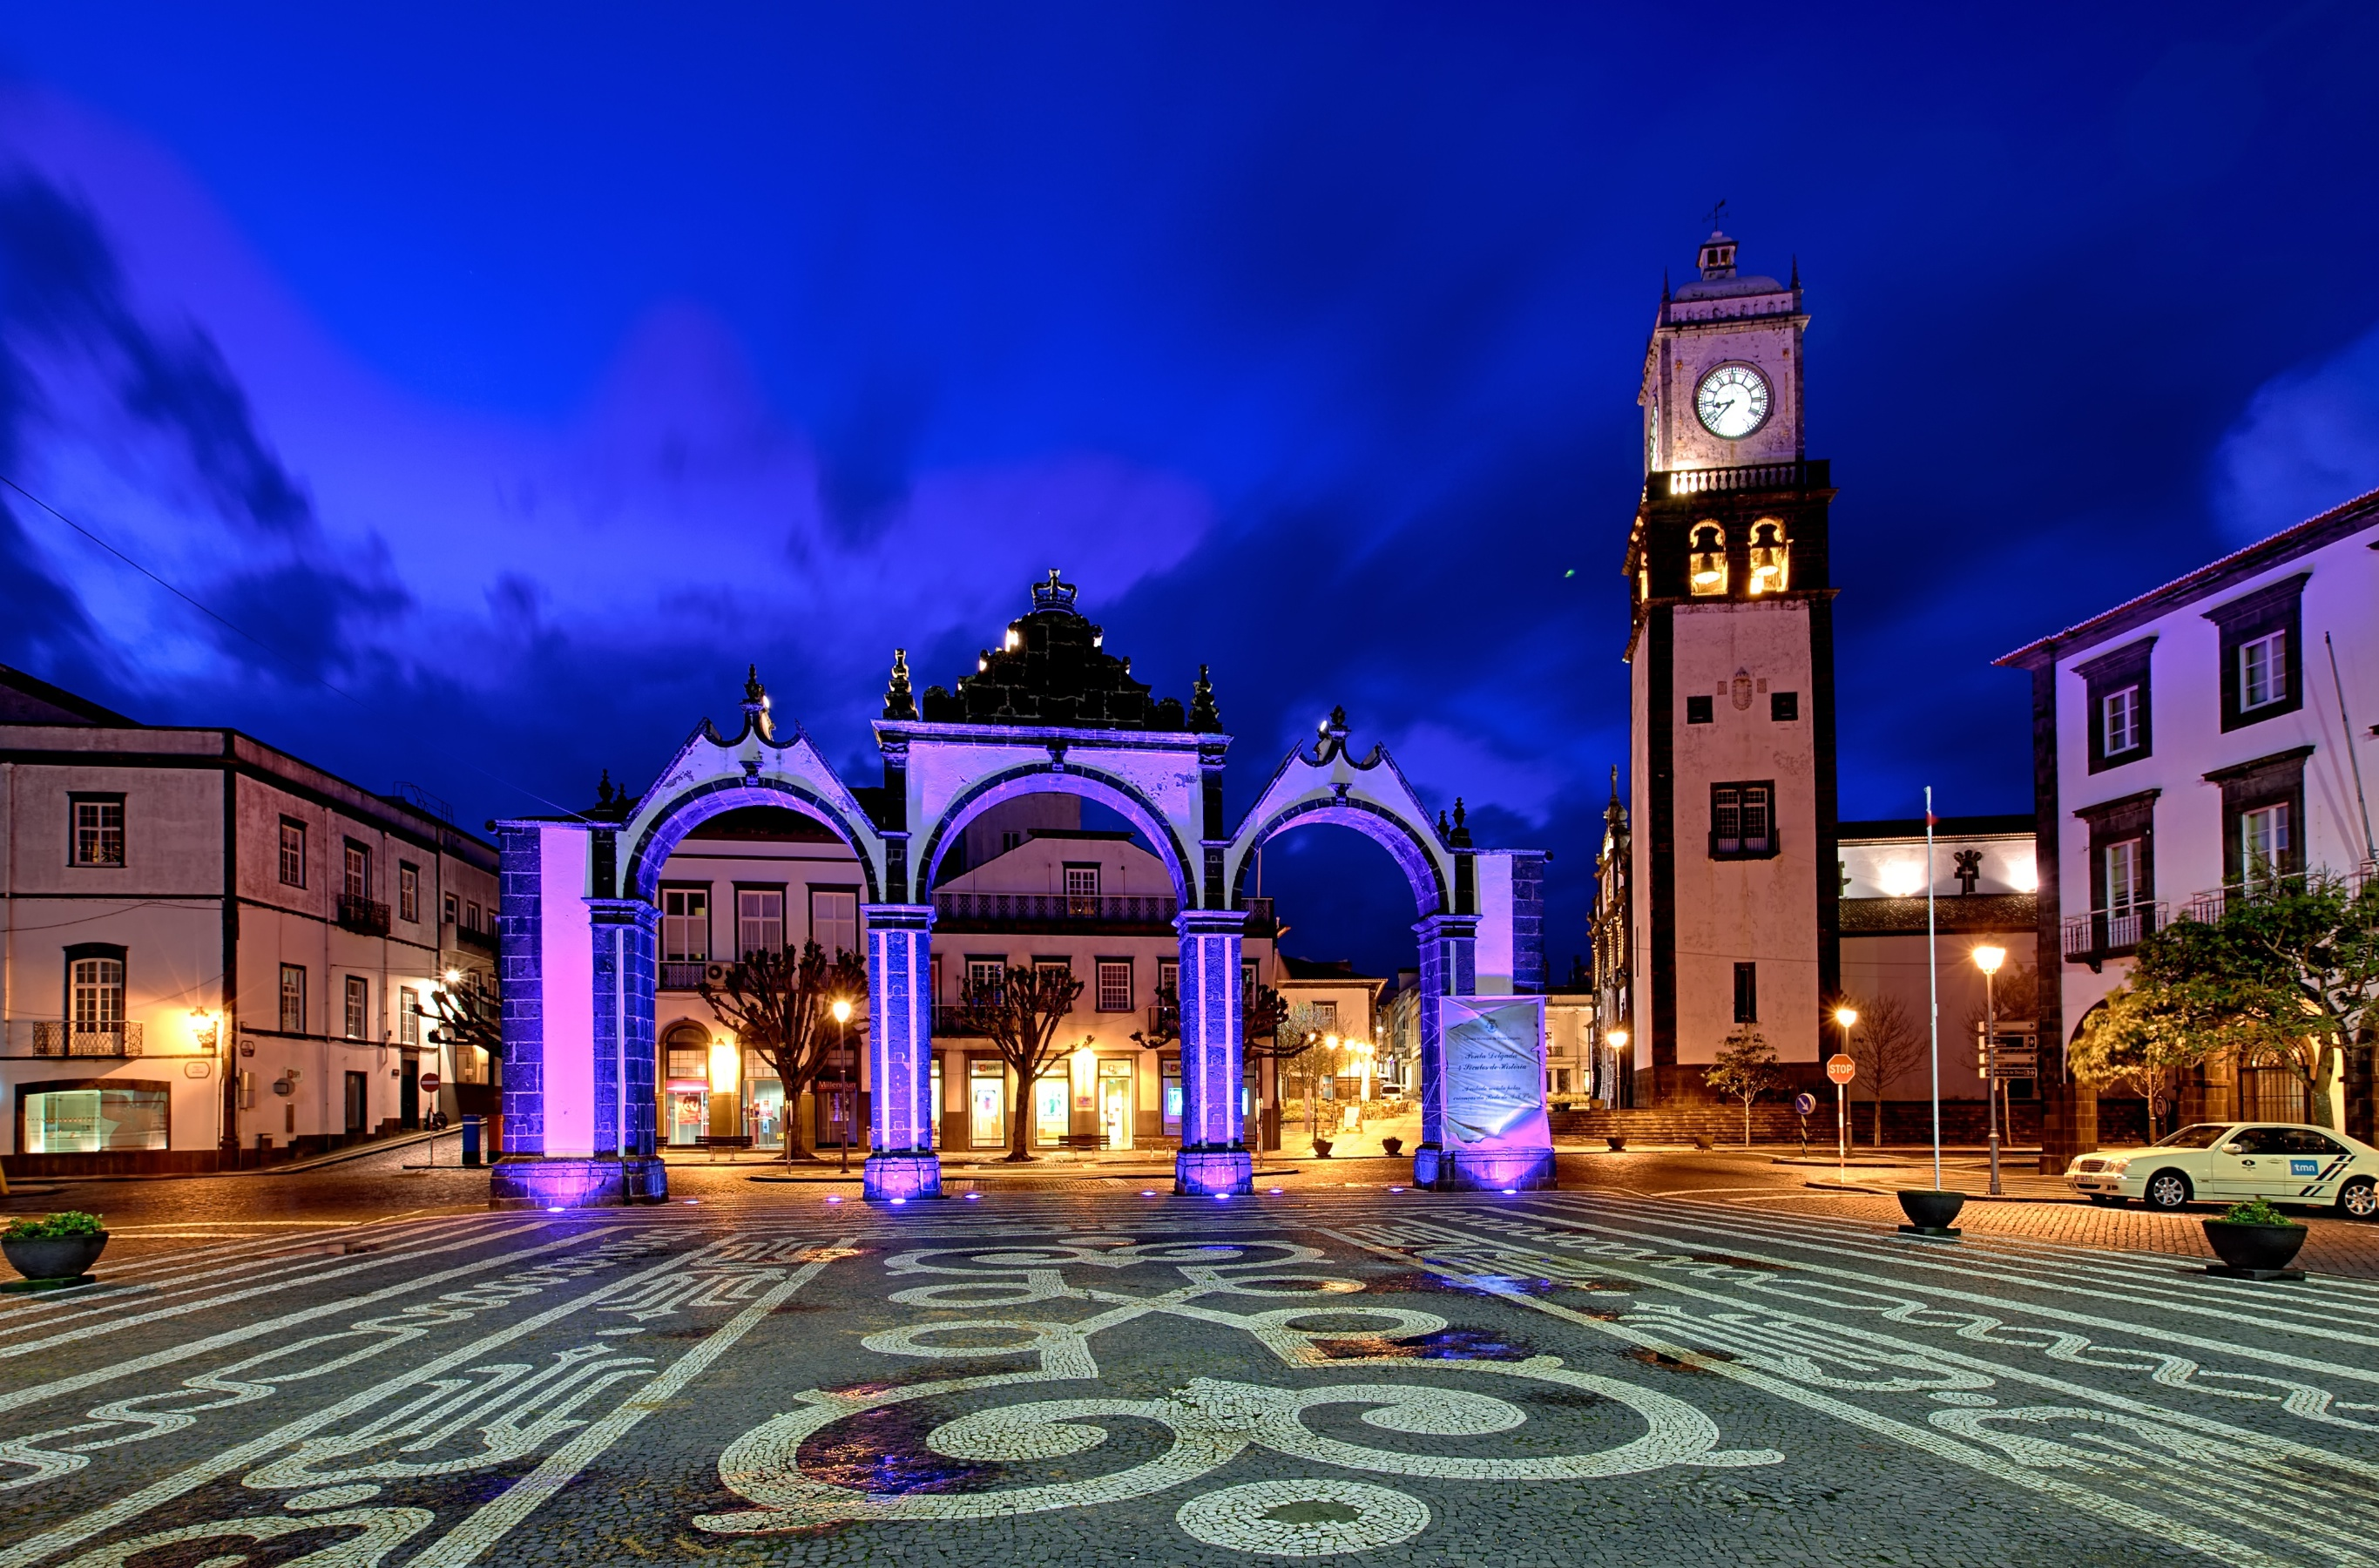 Ponta_Delgada_Azores_-_2013-04-02_-_90143539